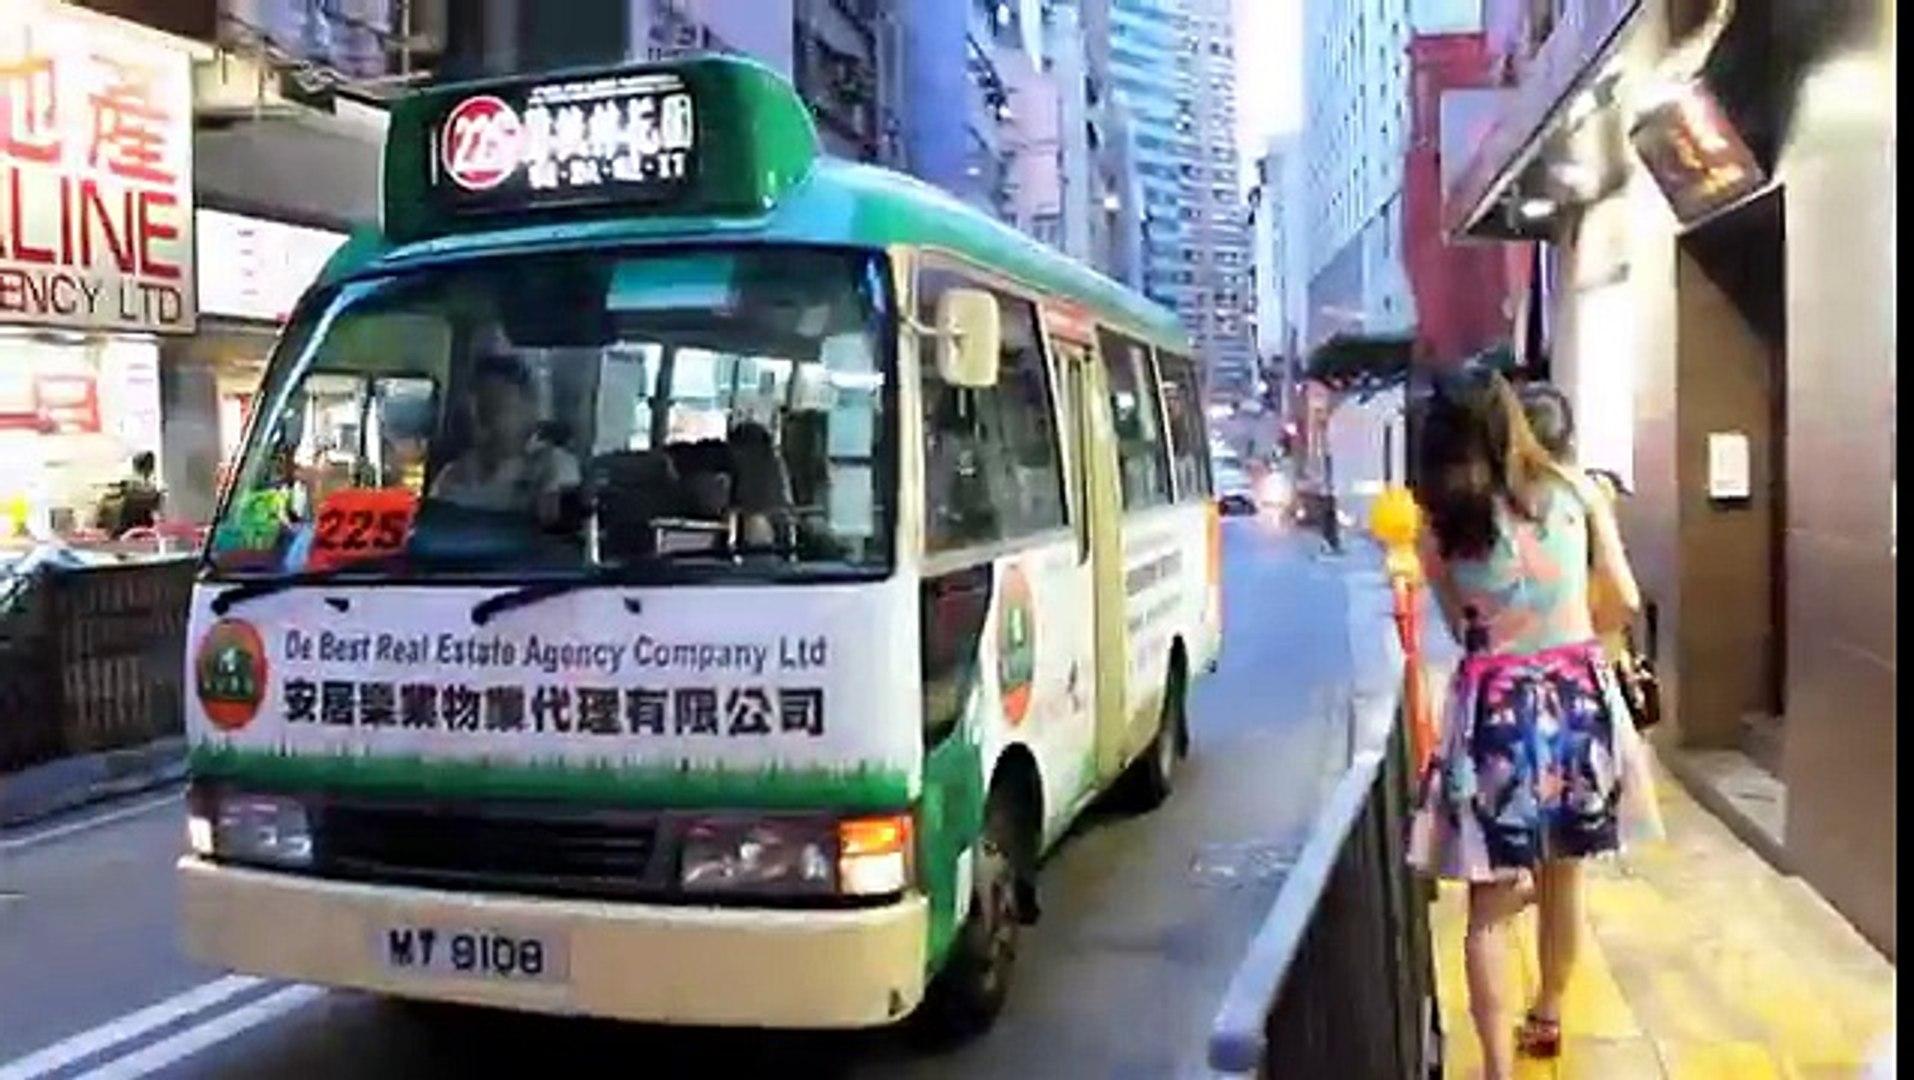 HONG KONG TRAVEL ADVENTURES